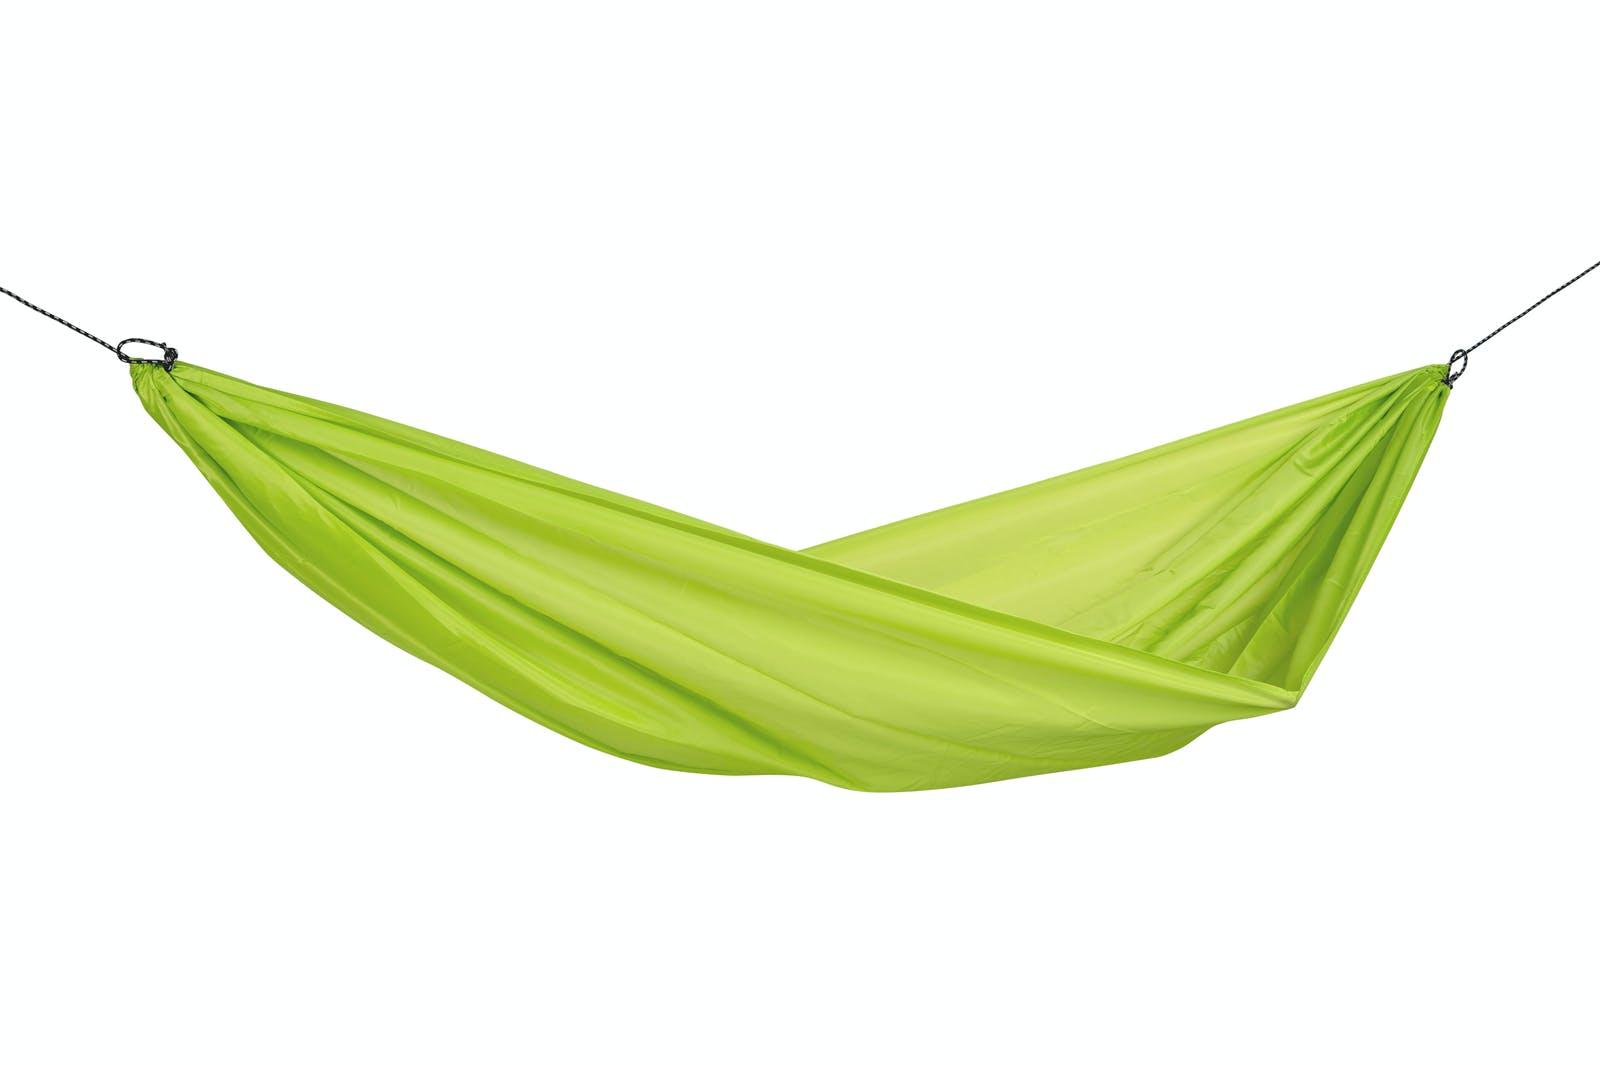 Hamac de jardin / voyage / randonnée ultra léger, avec crochets Travel Set Lime L AMAZONAS